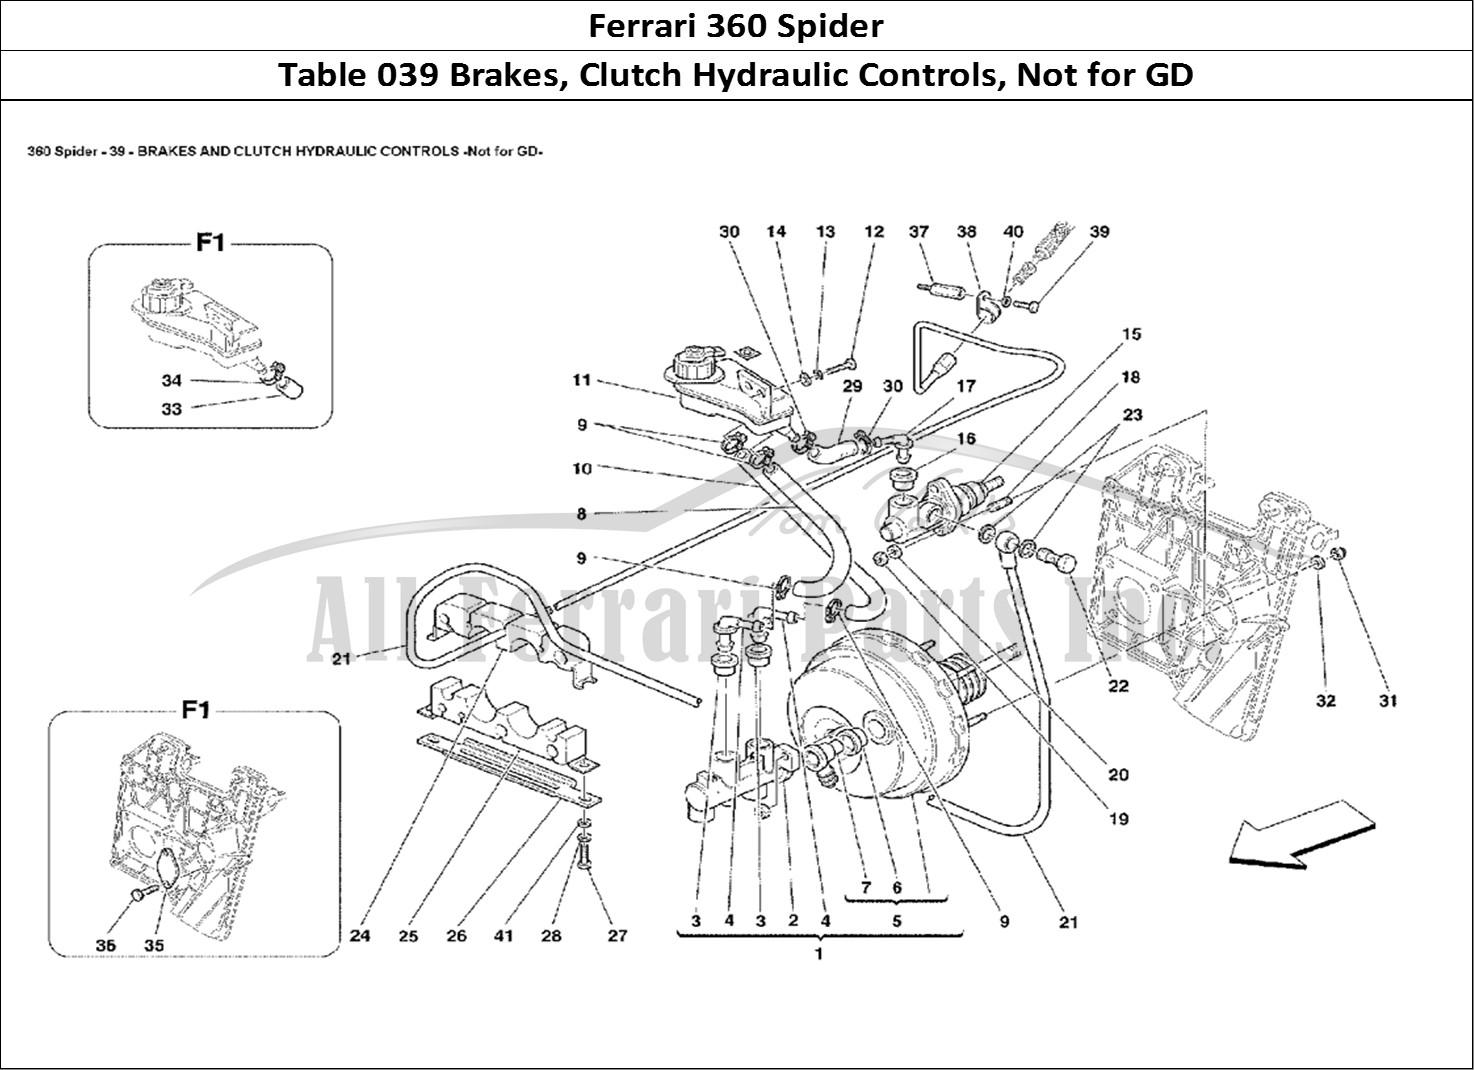 Buy Original Ferrari 360 Spider 039 Brakes Clutch Hydraulic Controls Not For Gd Ferrari Parts